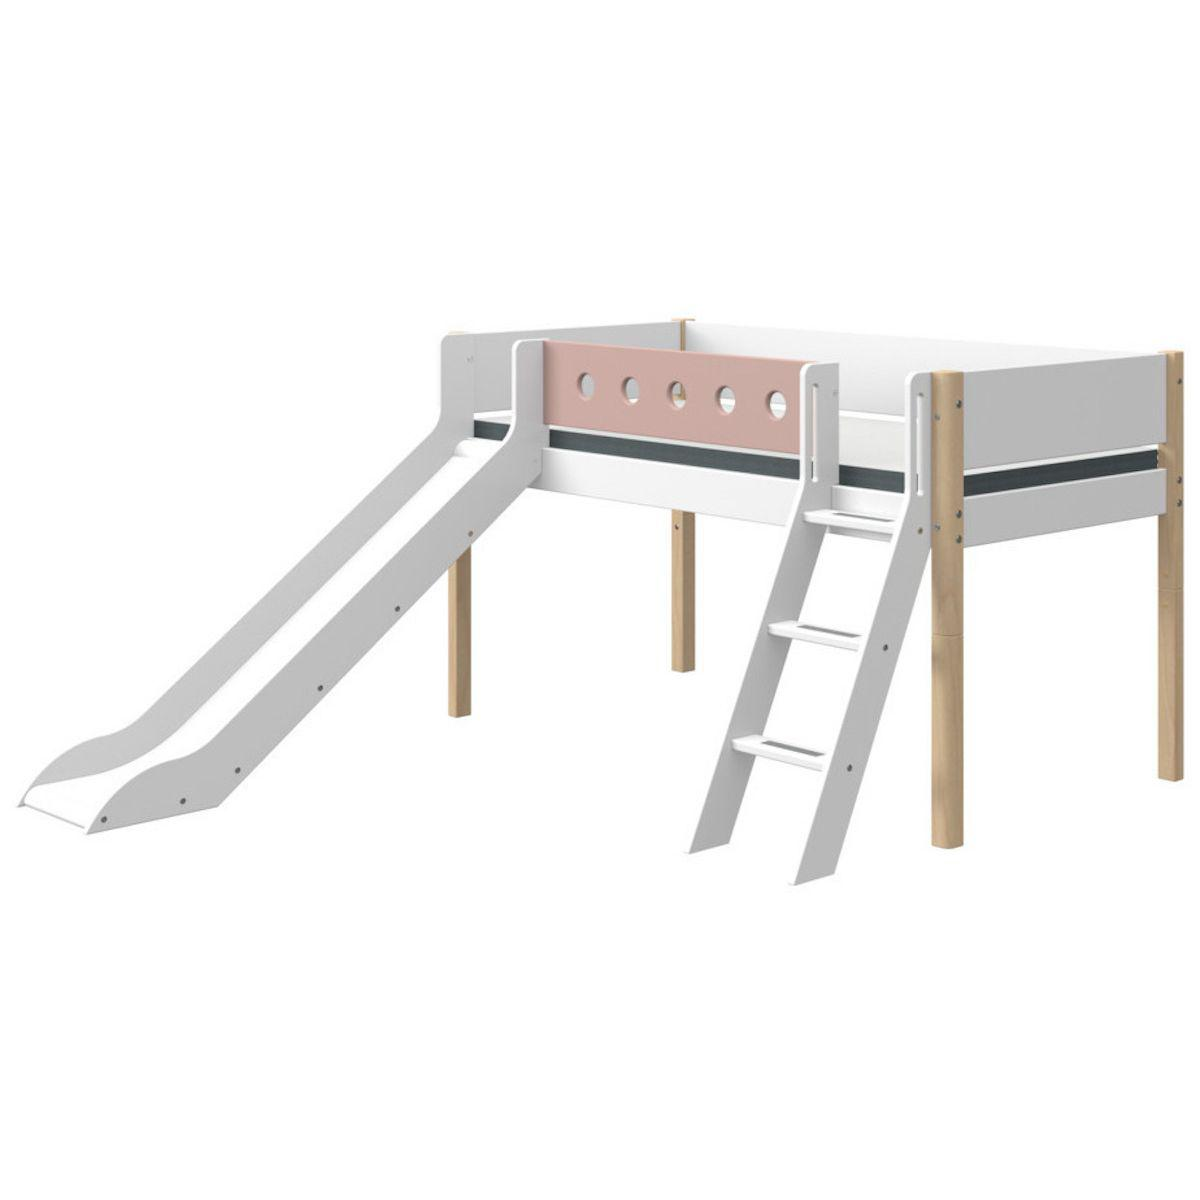 Cama media alta 90x200cm escalera inclinada-tobogán WHITE Flexa natural-rosa claro